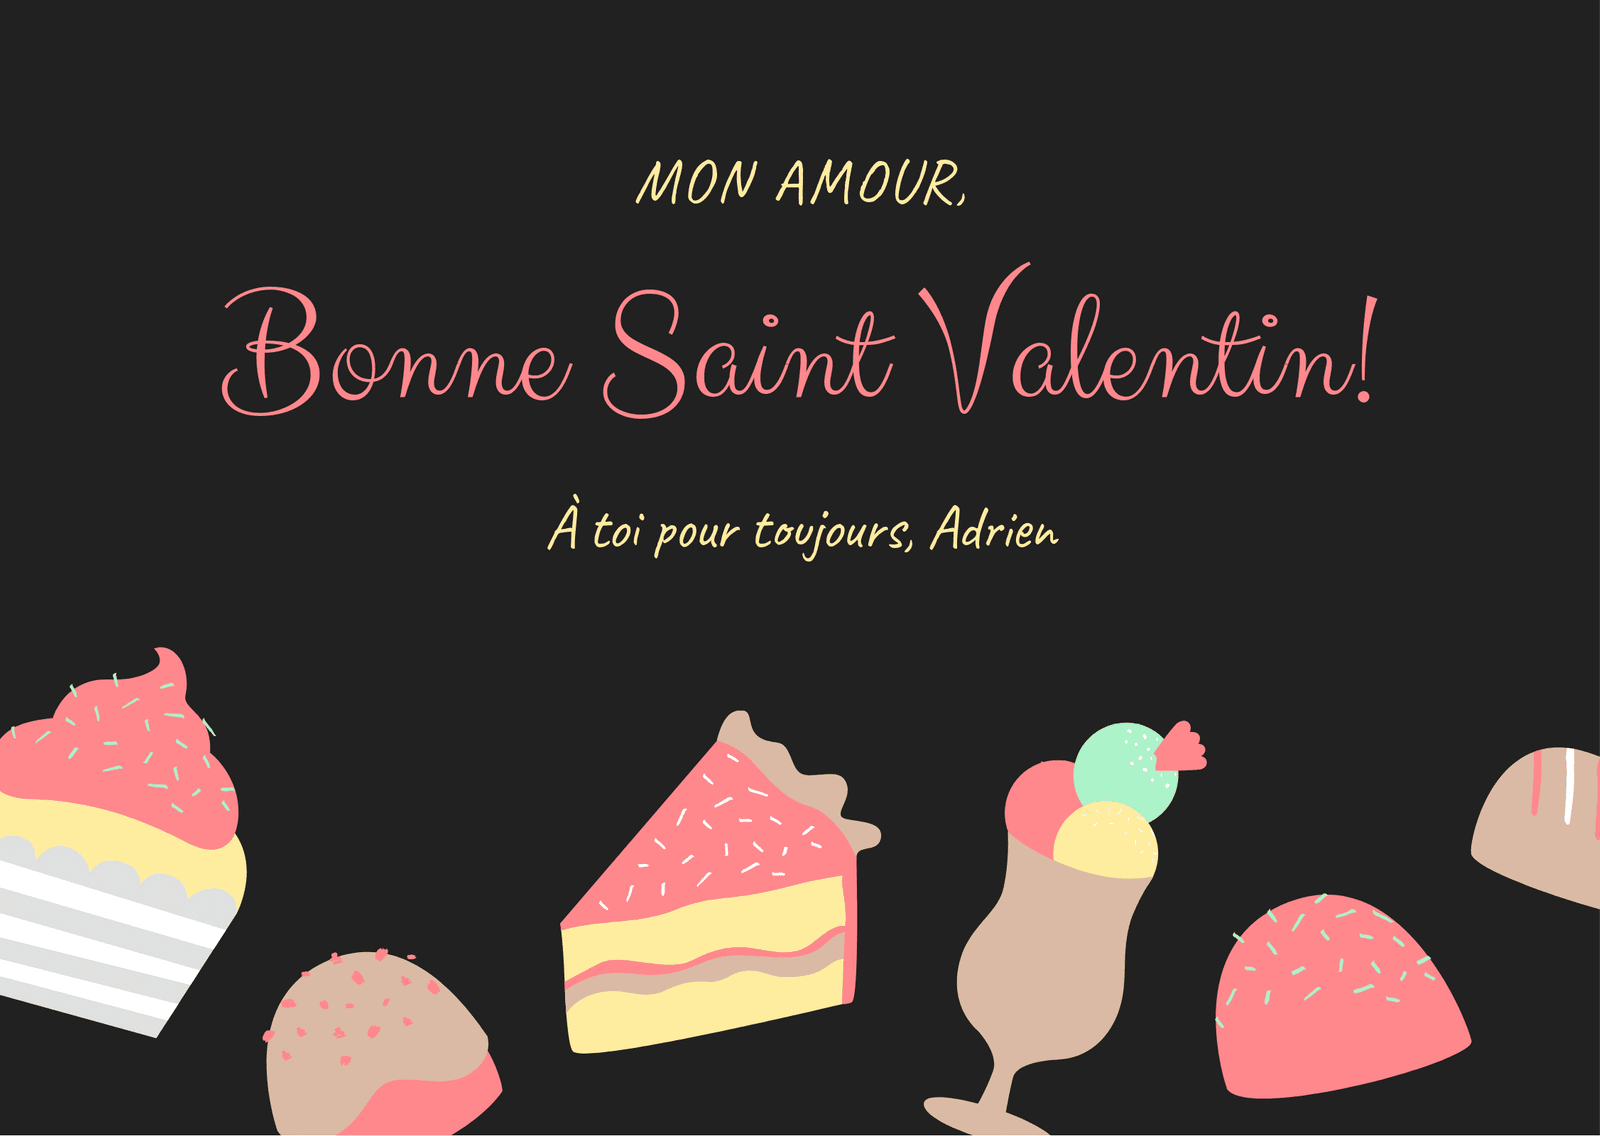 Charbon Saint-Valentin Carte